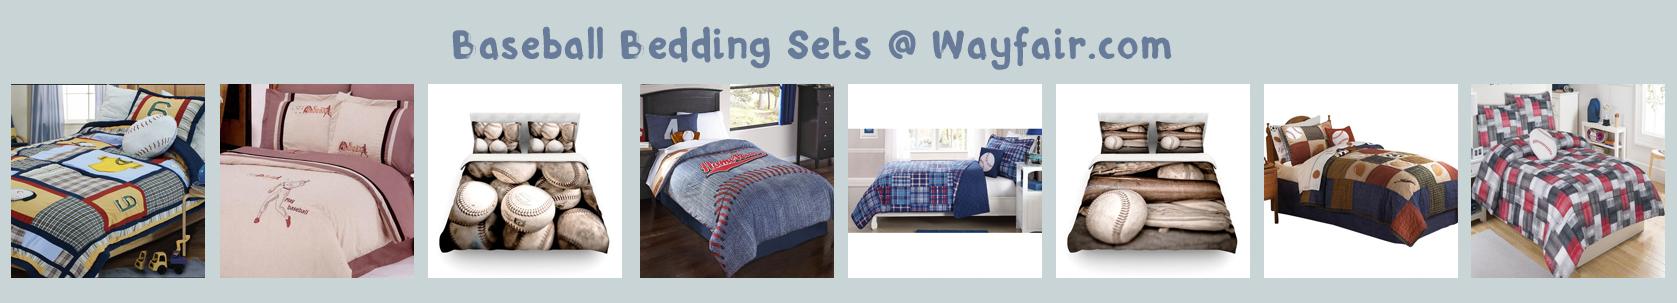 wayfair baseball bedding banner